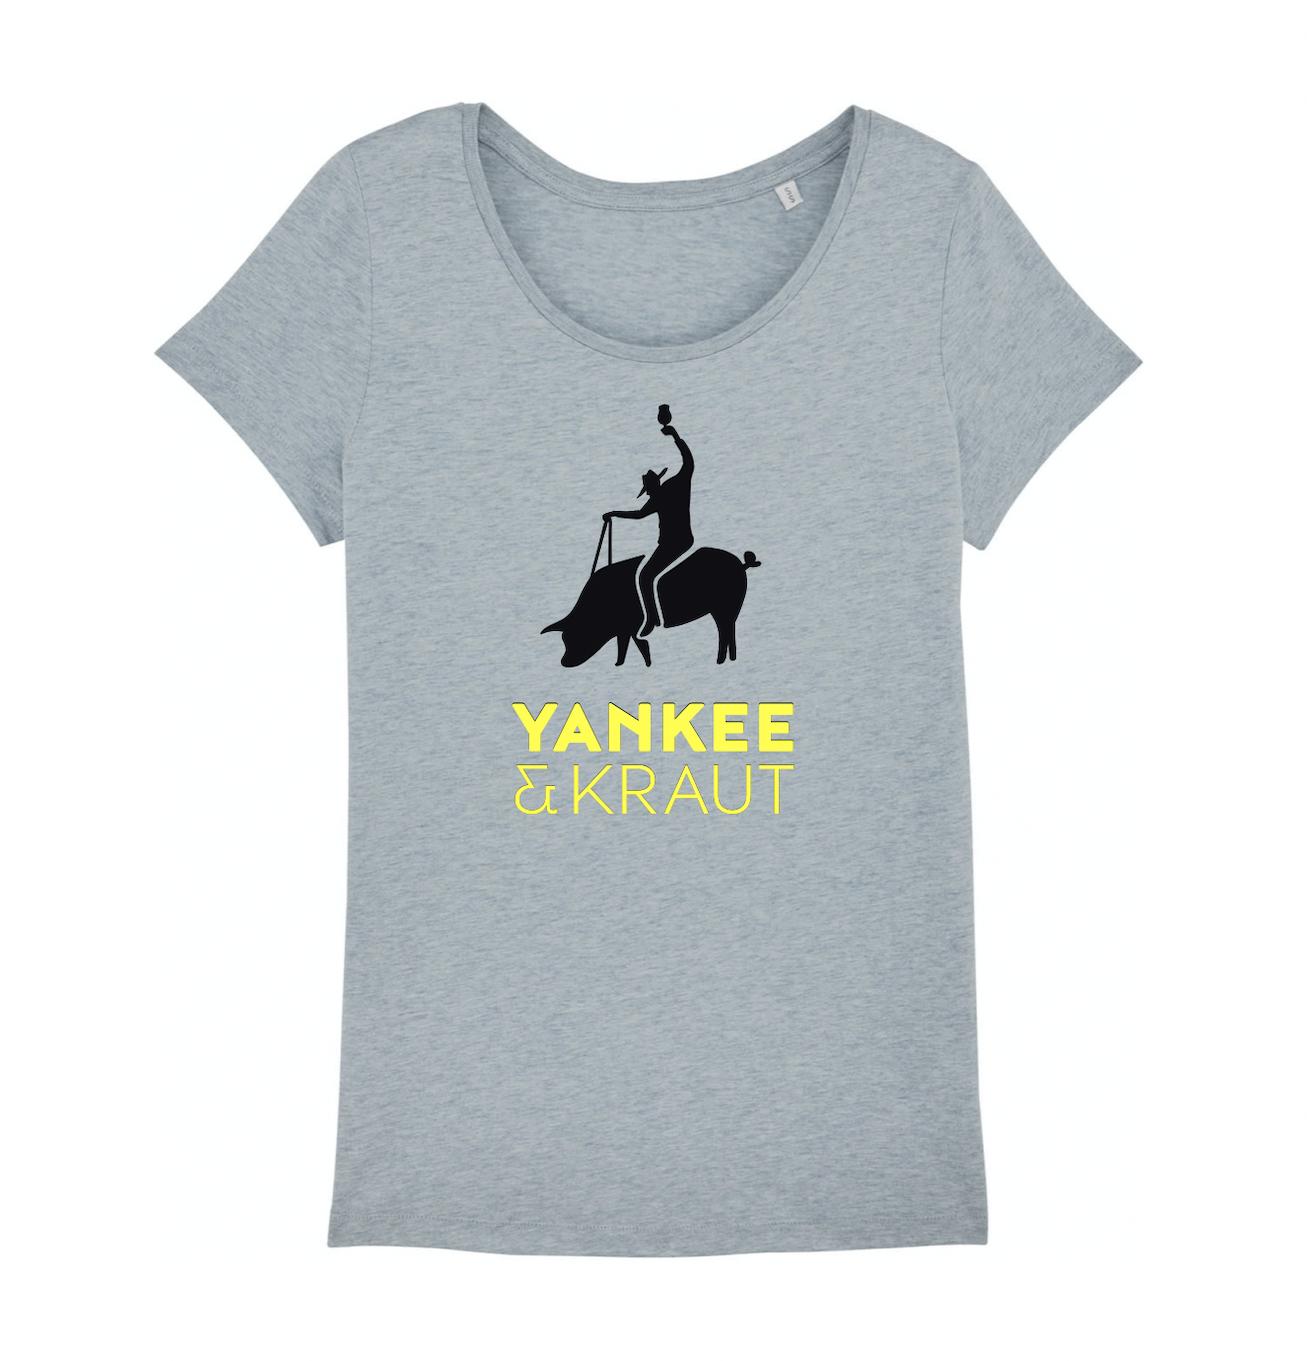 Frauen T-Shirt - Heather Ice Blue